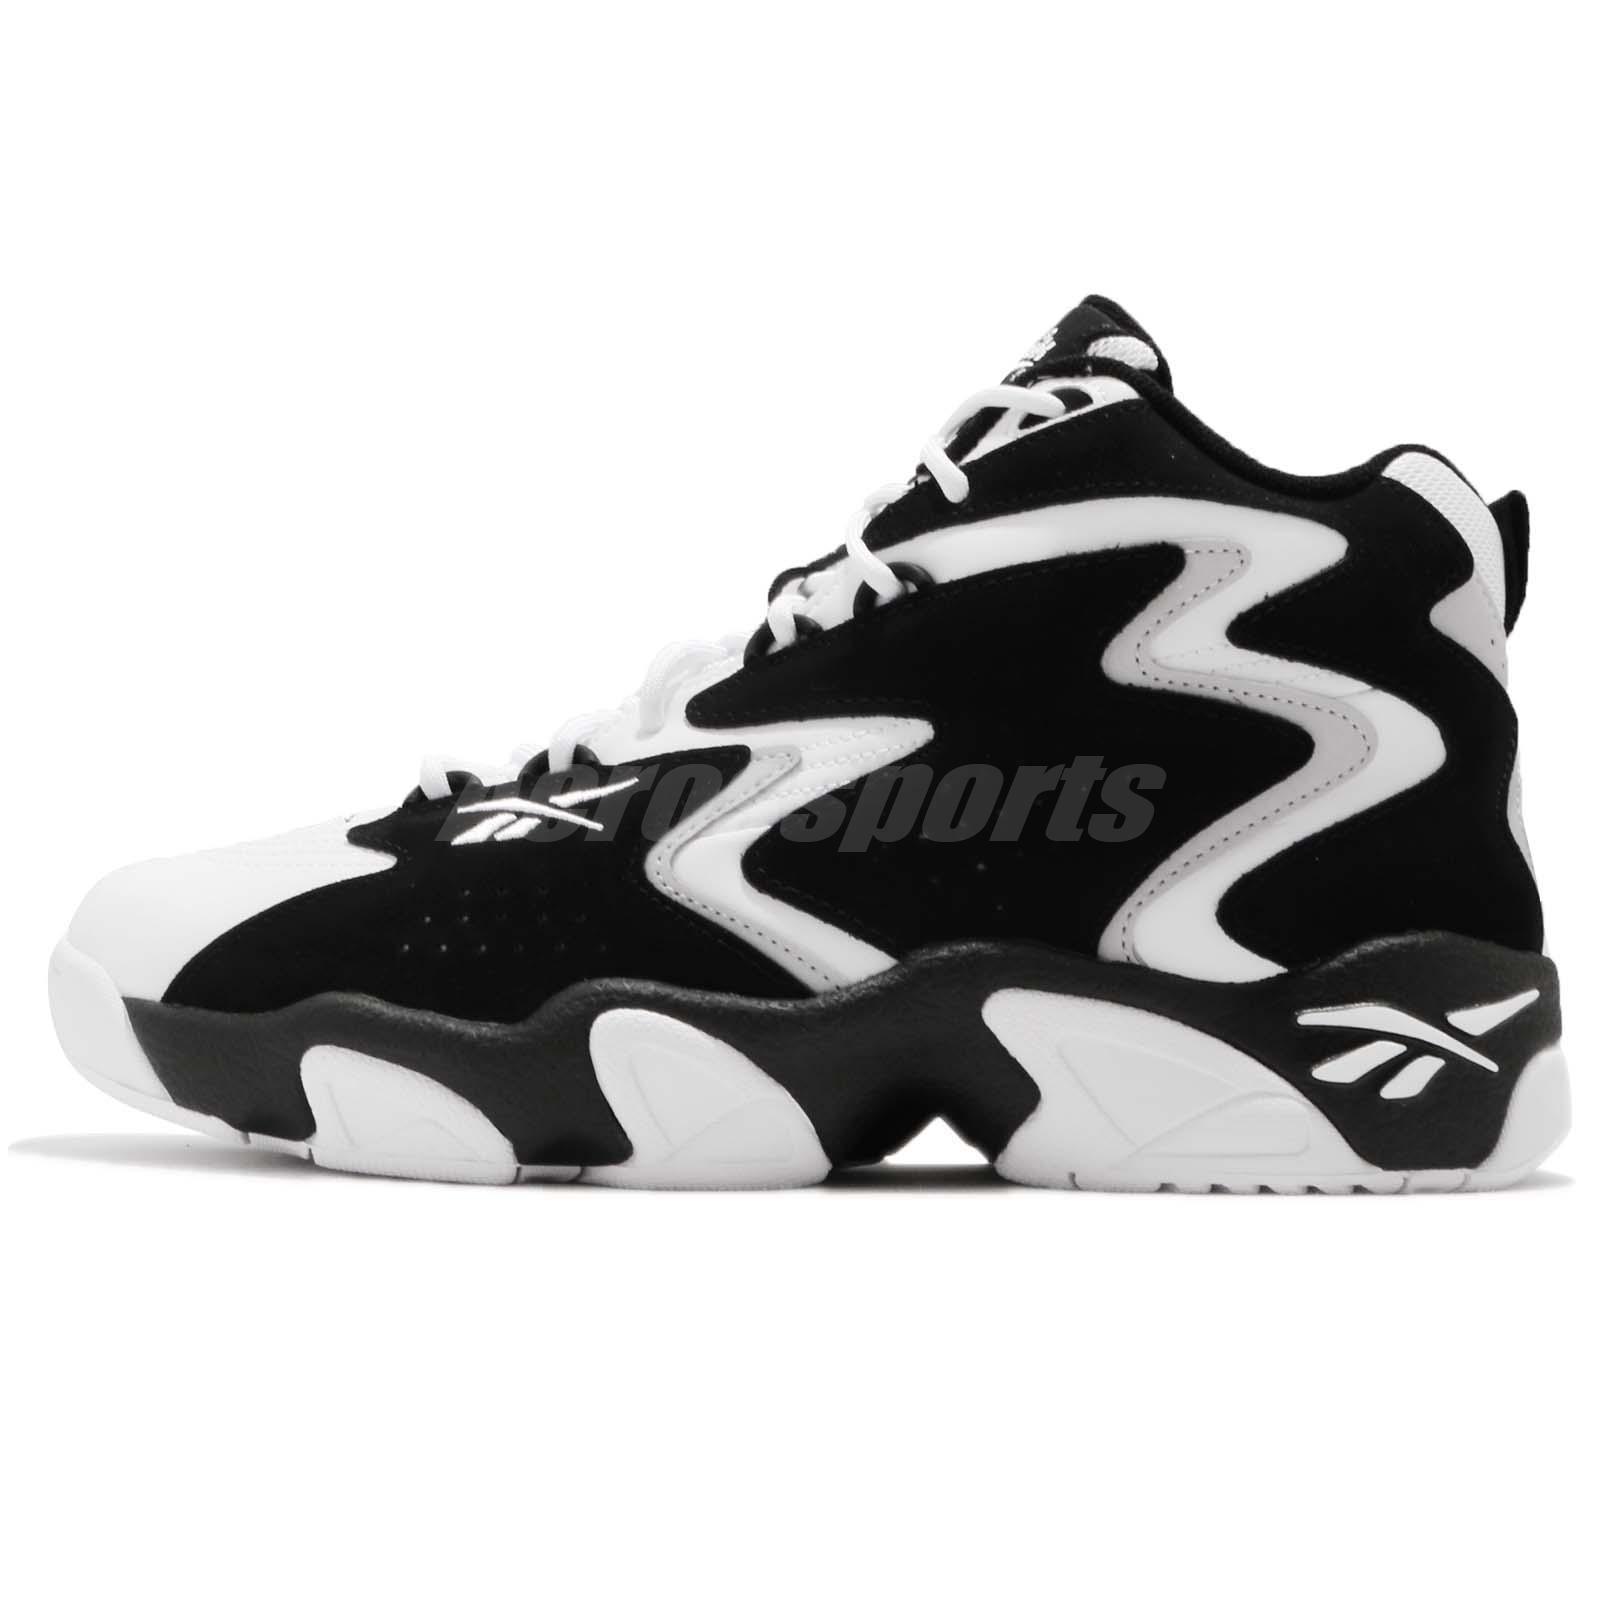 3b5b26e47e5 Men Cn7884 Reebok Shoes White Sneakers Mobius Black Mu Og Basketball  wXaqT7X4zZ